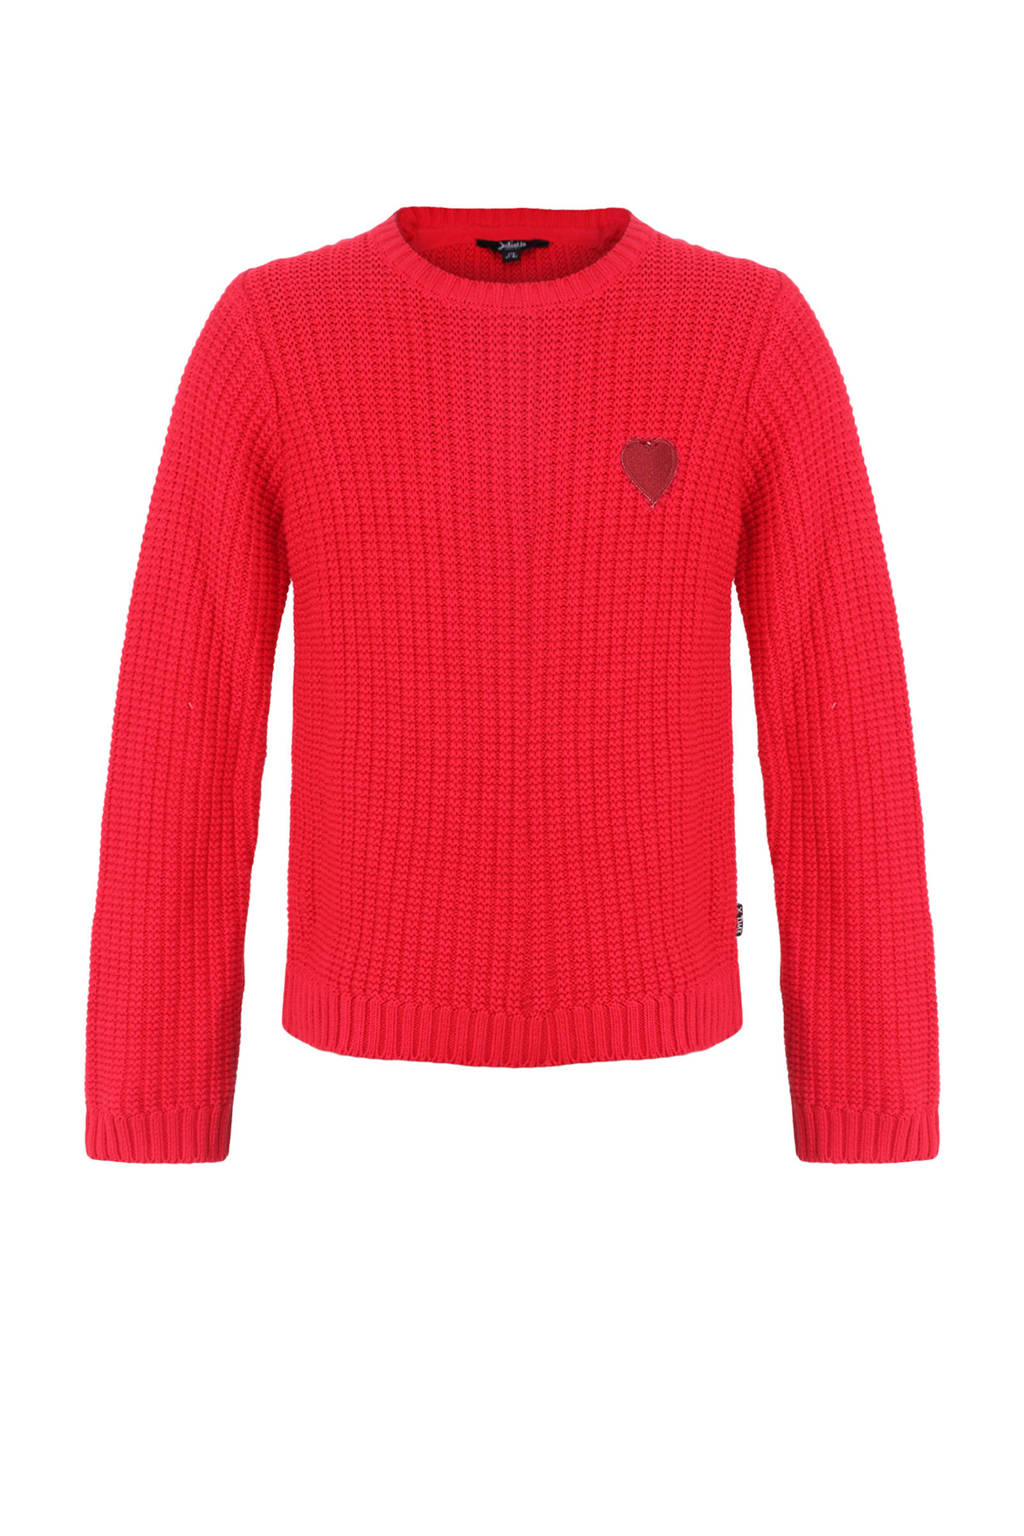 Little Miss Juliette sweater met printopdruk rood, Rood